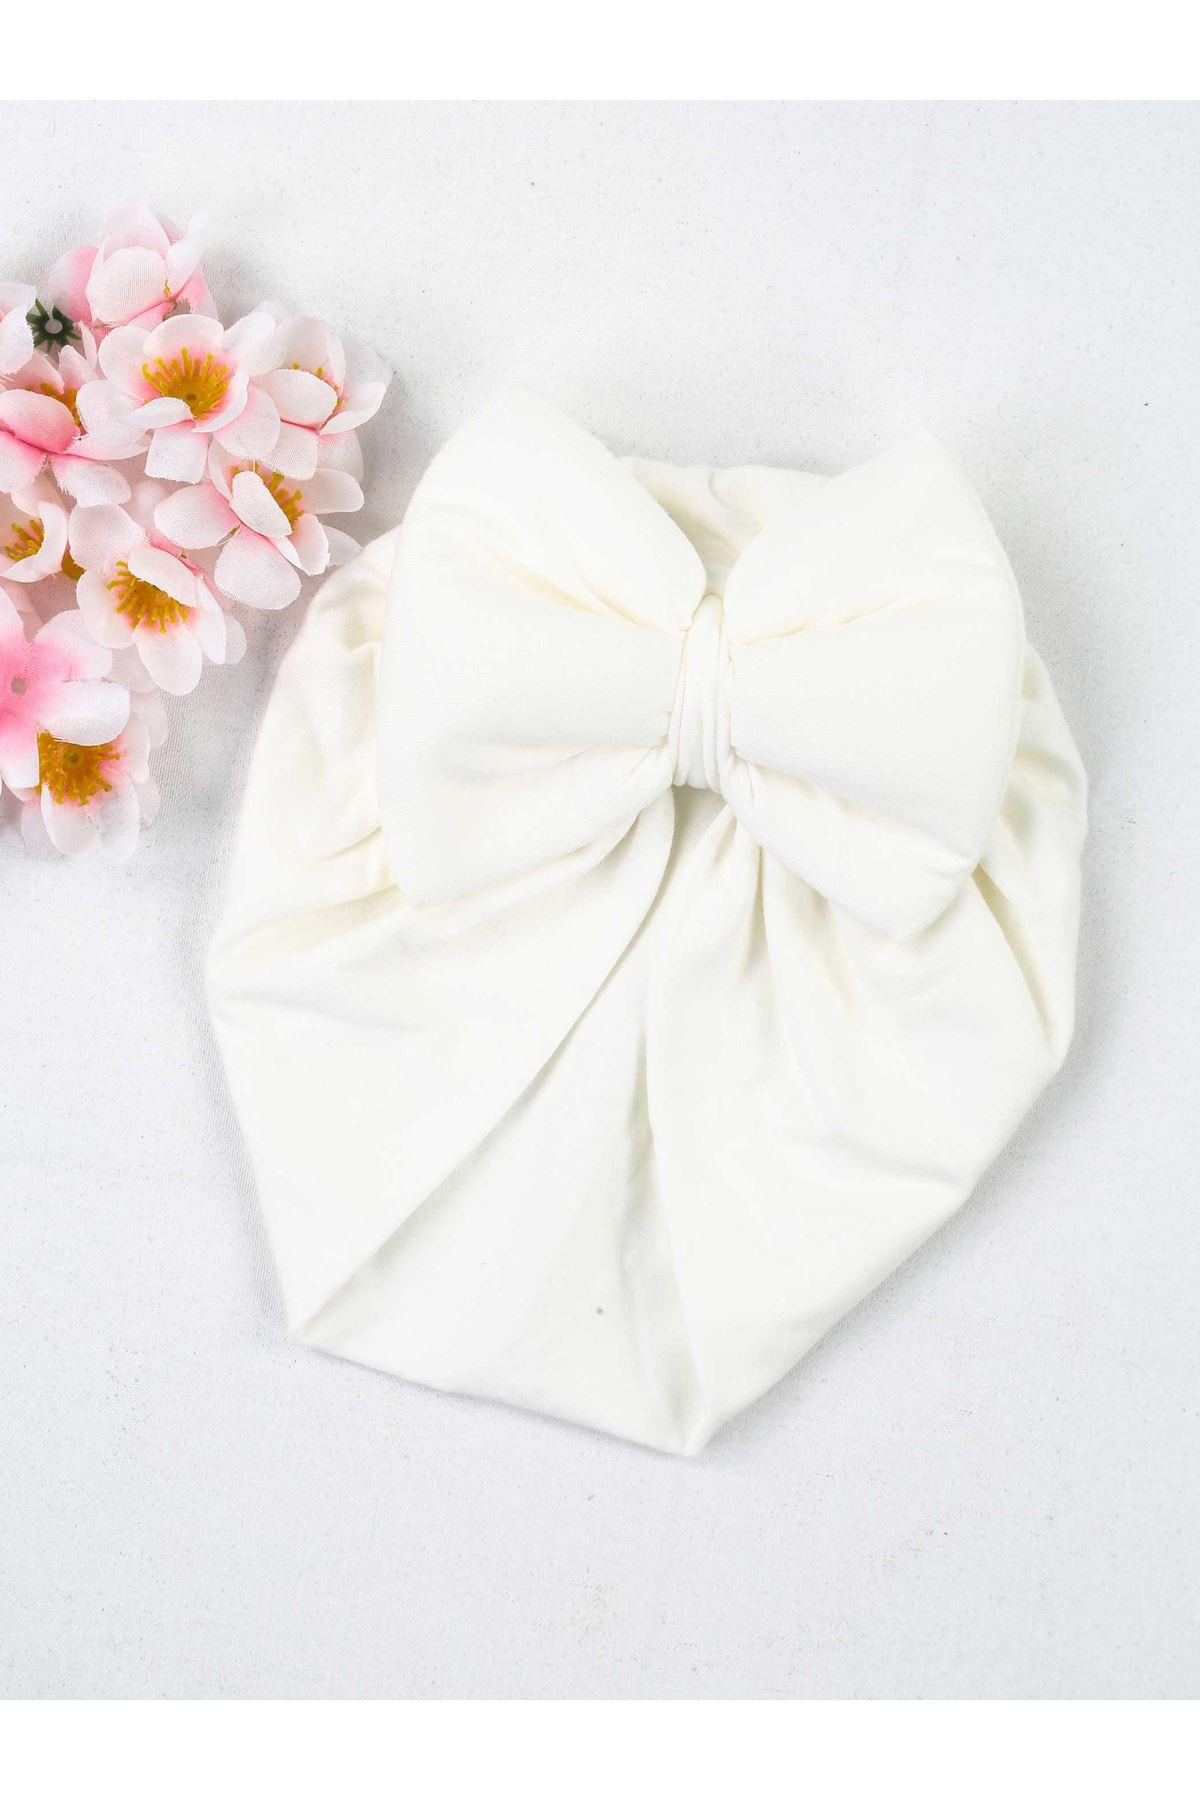 Beyaz Fiyonklu Kız Bebek Bone